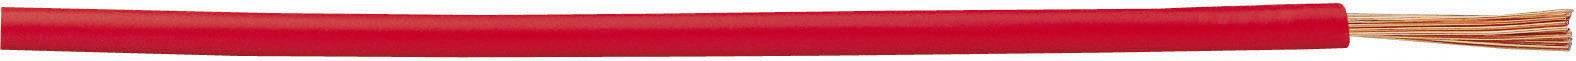 Kabel LappKabel H07V-K 4520041, 1x 1,50 mm², PVC, Ø 3 mm, 1 m, červená